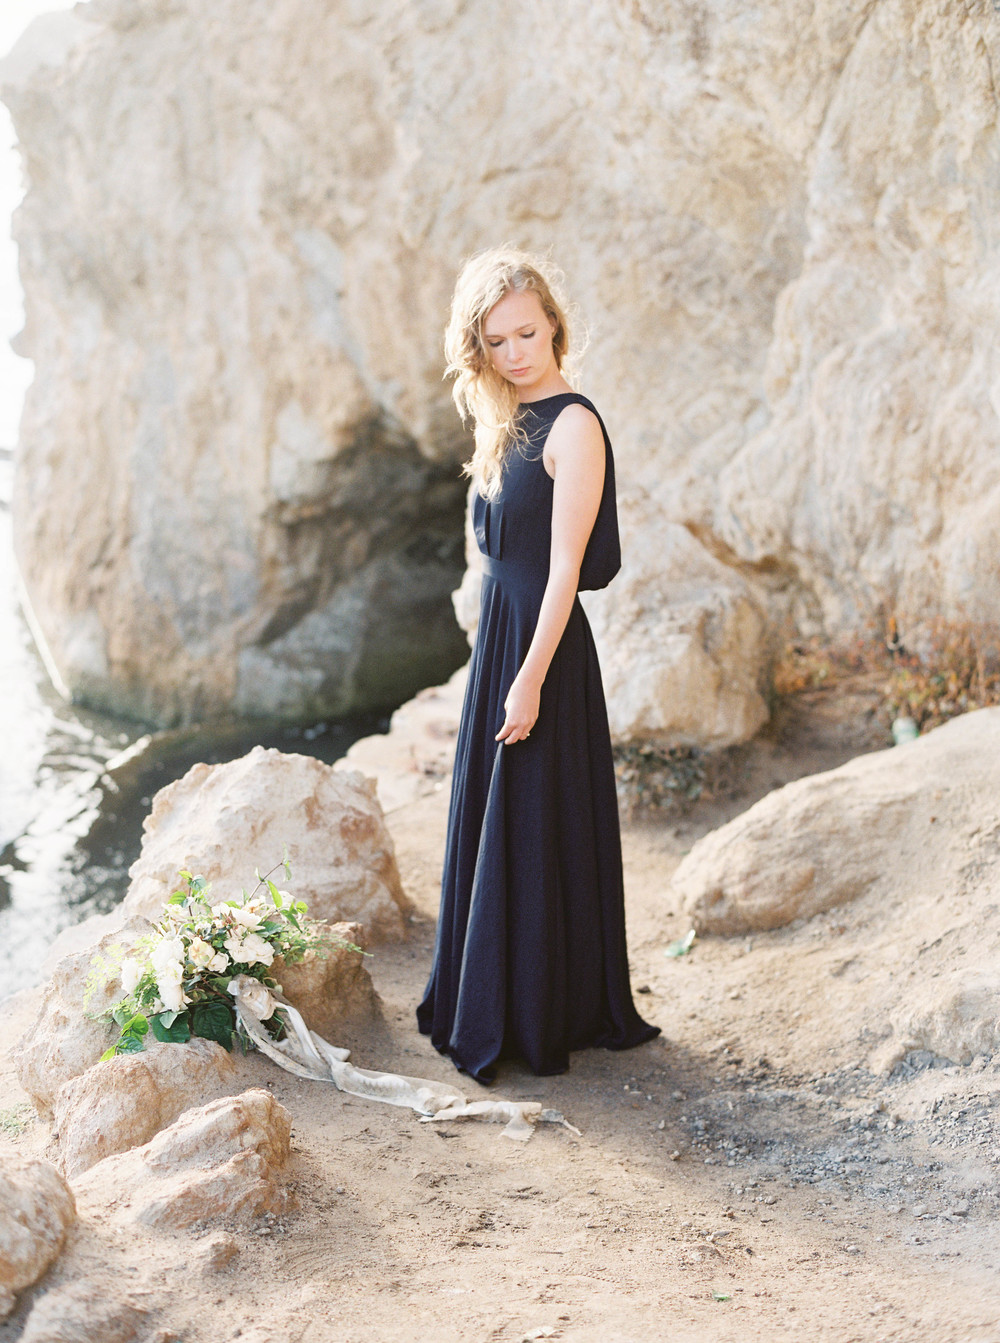 Meghan Mehan Photography - San Francisco | Napa | Sonoma | Santa Barbara - 032.jpg